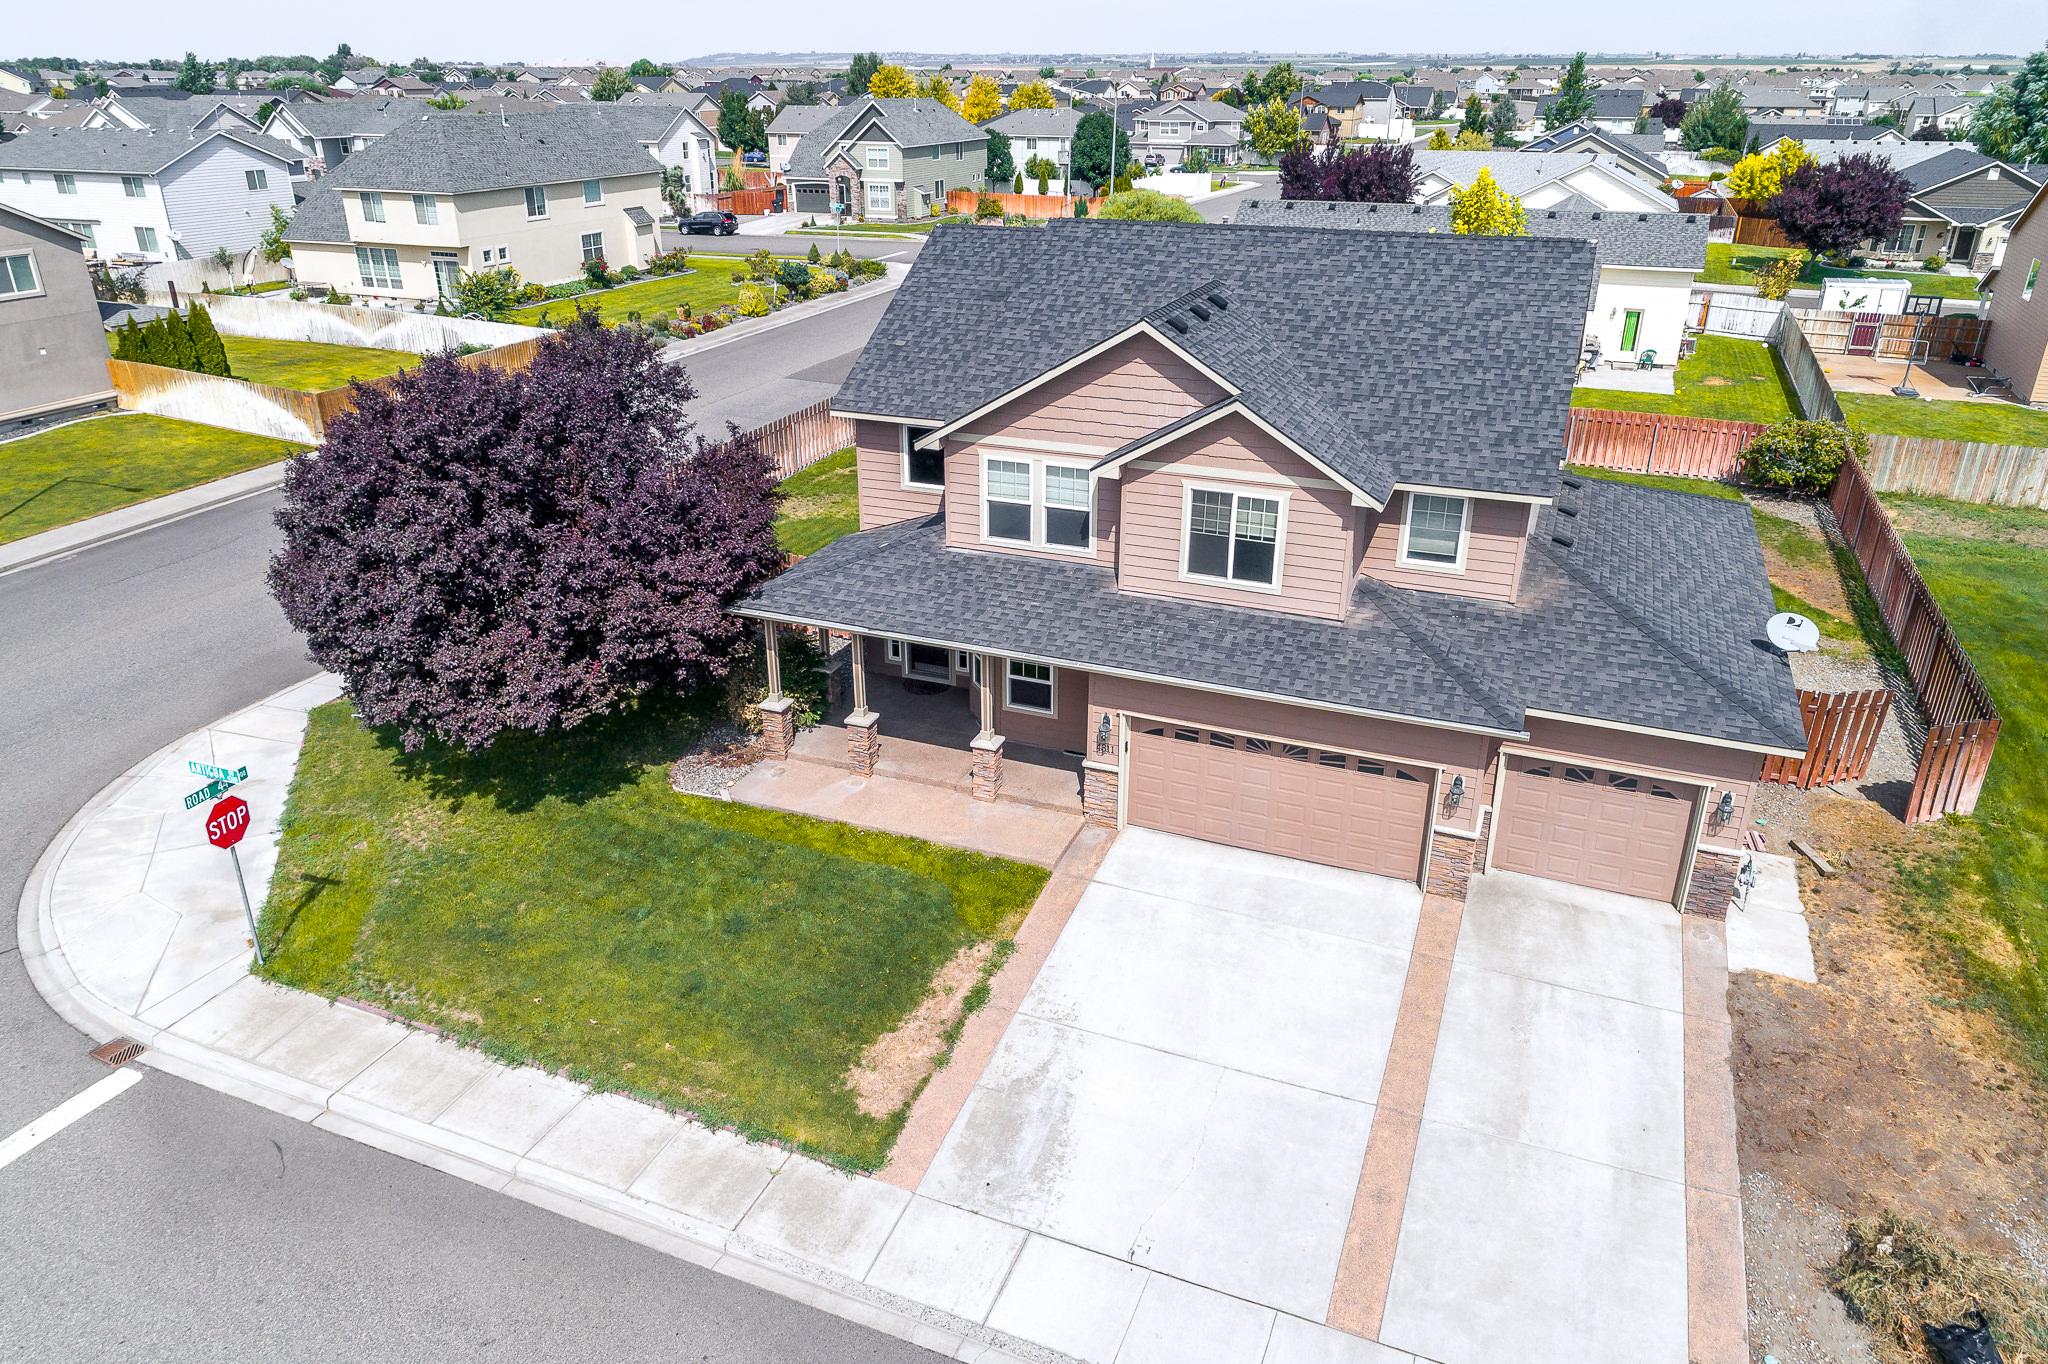 Tri-cities aerial real-estate